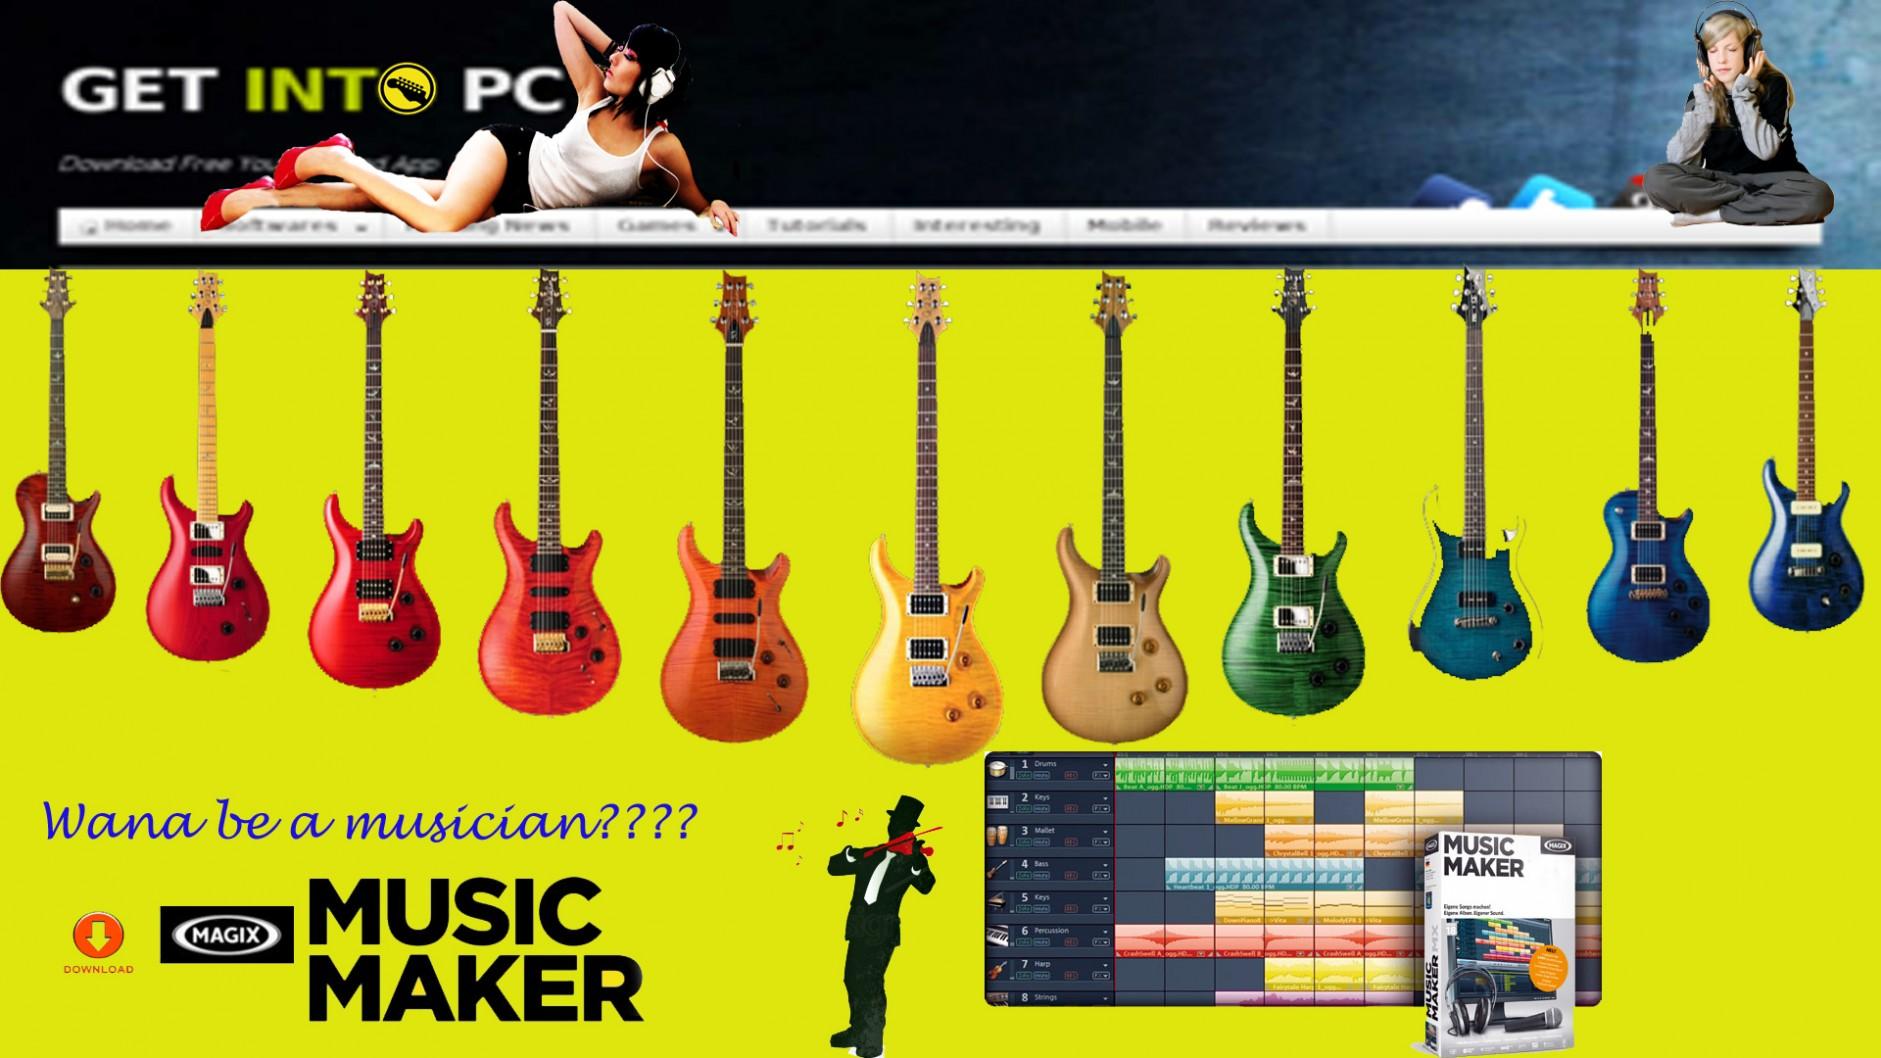 Magix Music Maker 2014 Premium setup